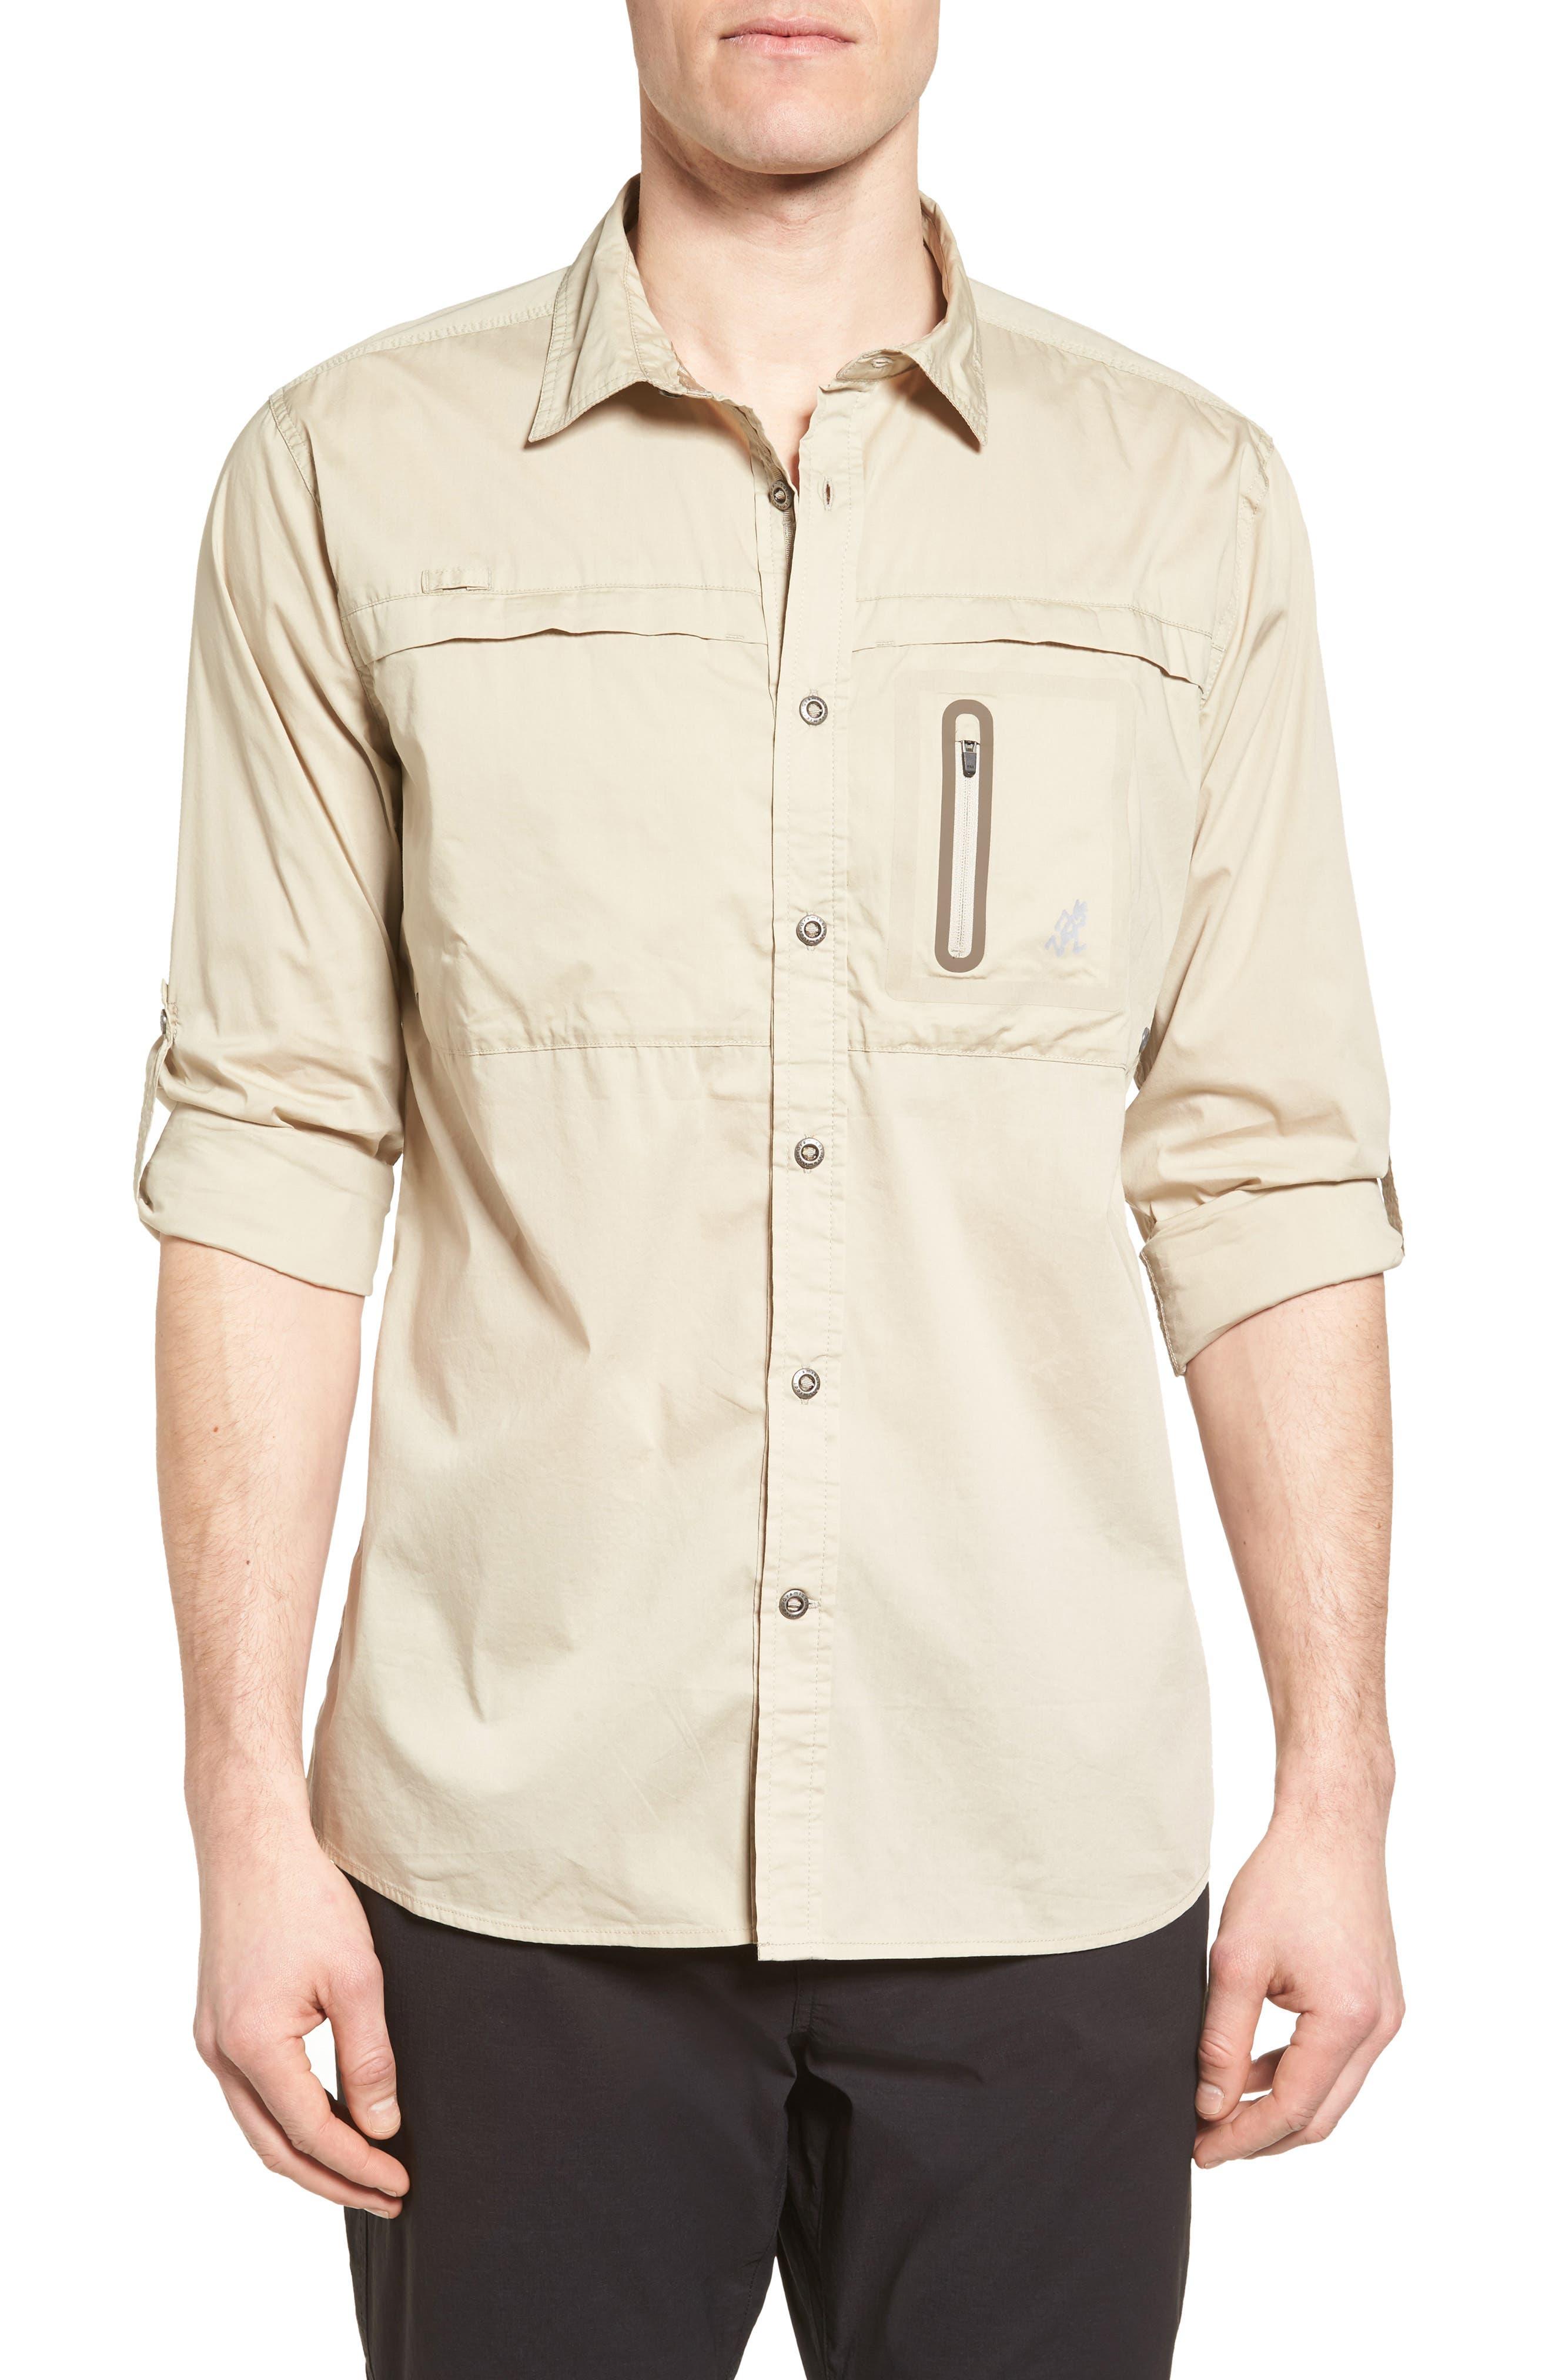 Gramicci NO-Squito Regular Fit Travel Shirt